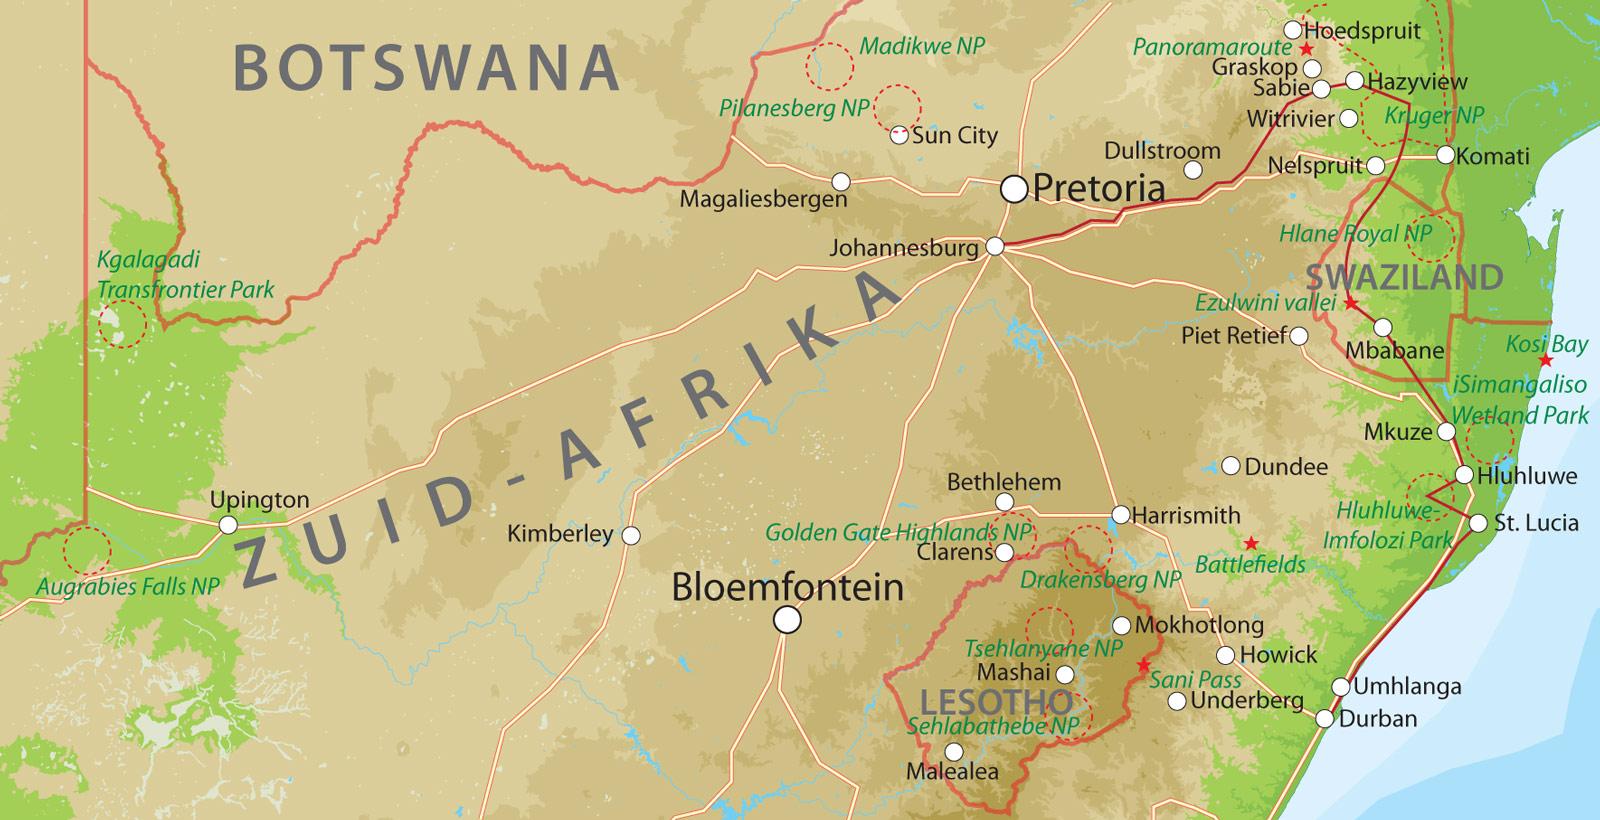 rondreis zuid afrika, kurgerpark en zululand bij van verreroutekaart safari krugerpark en zululand